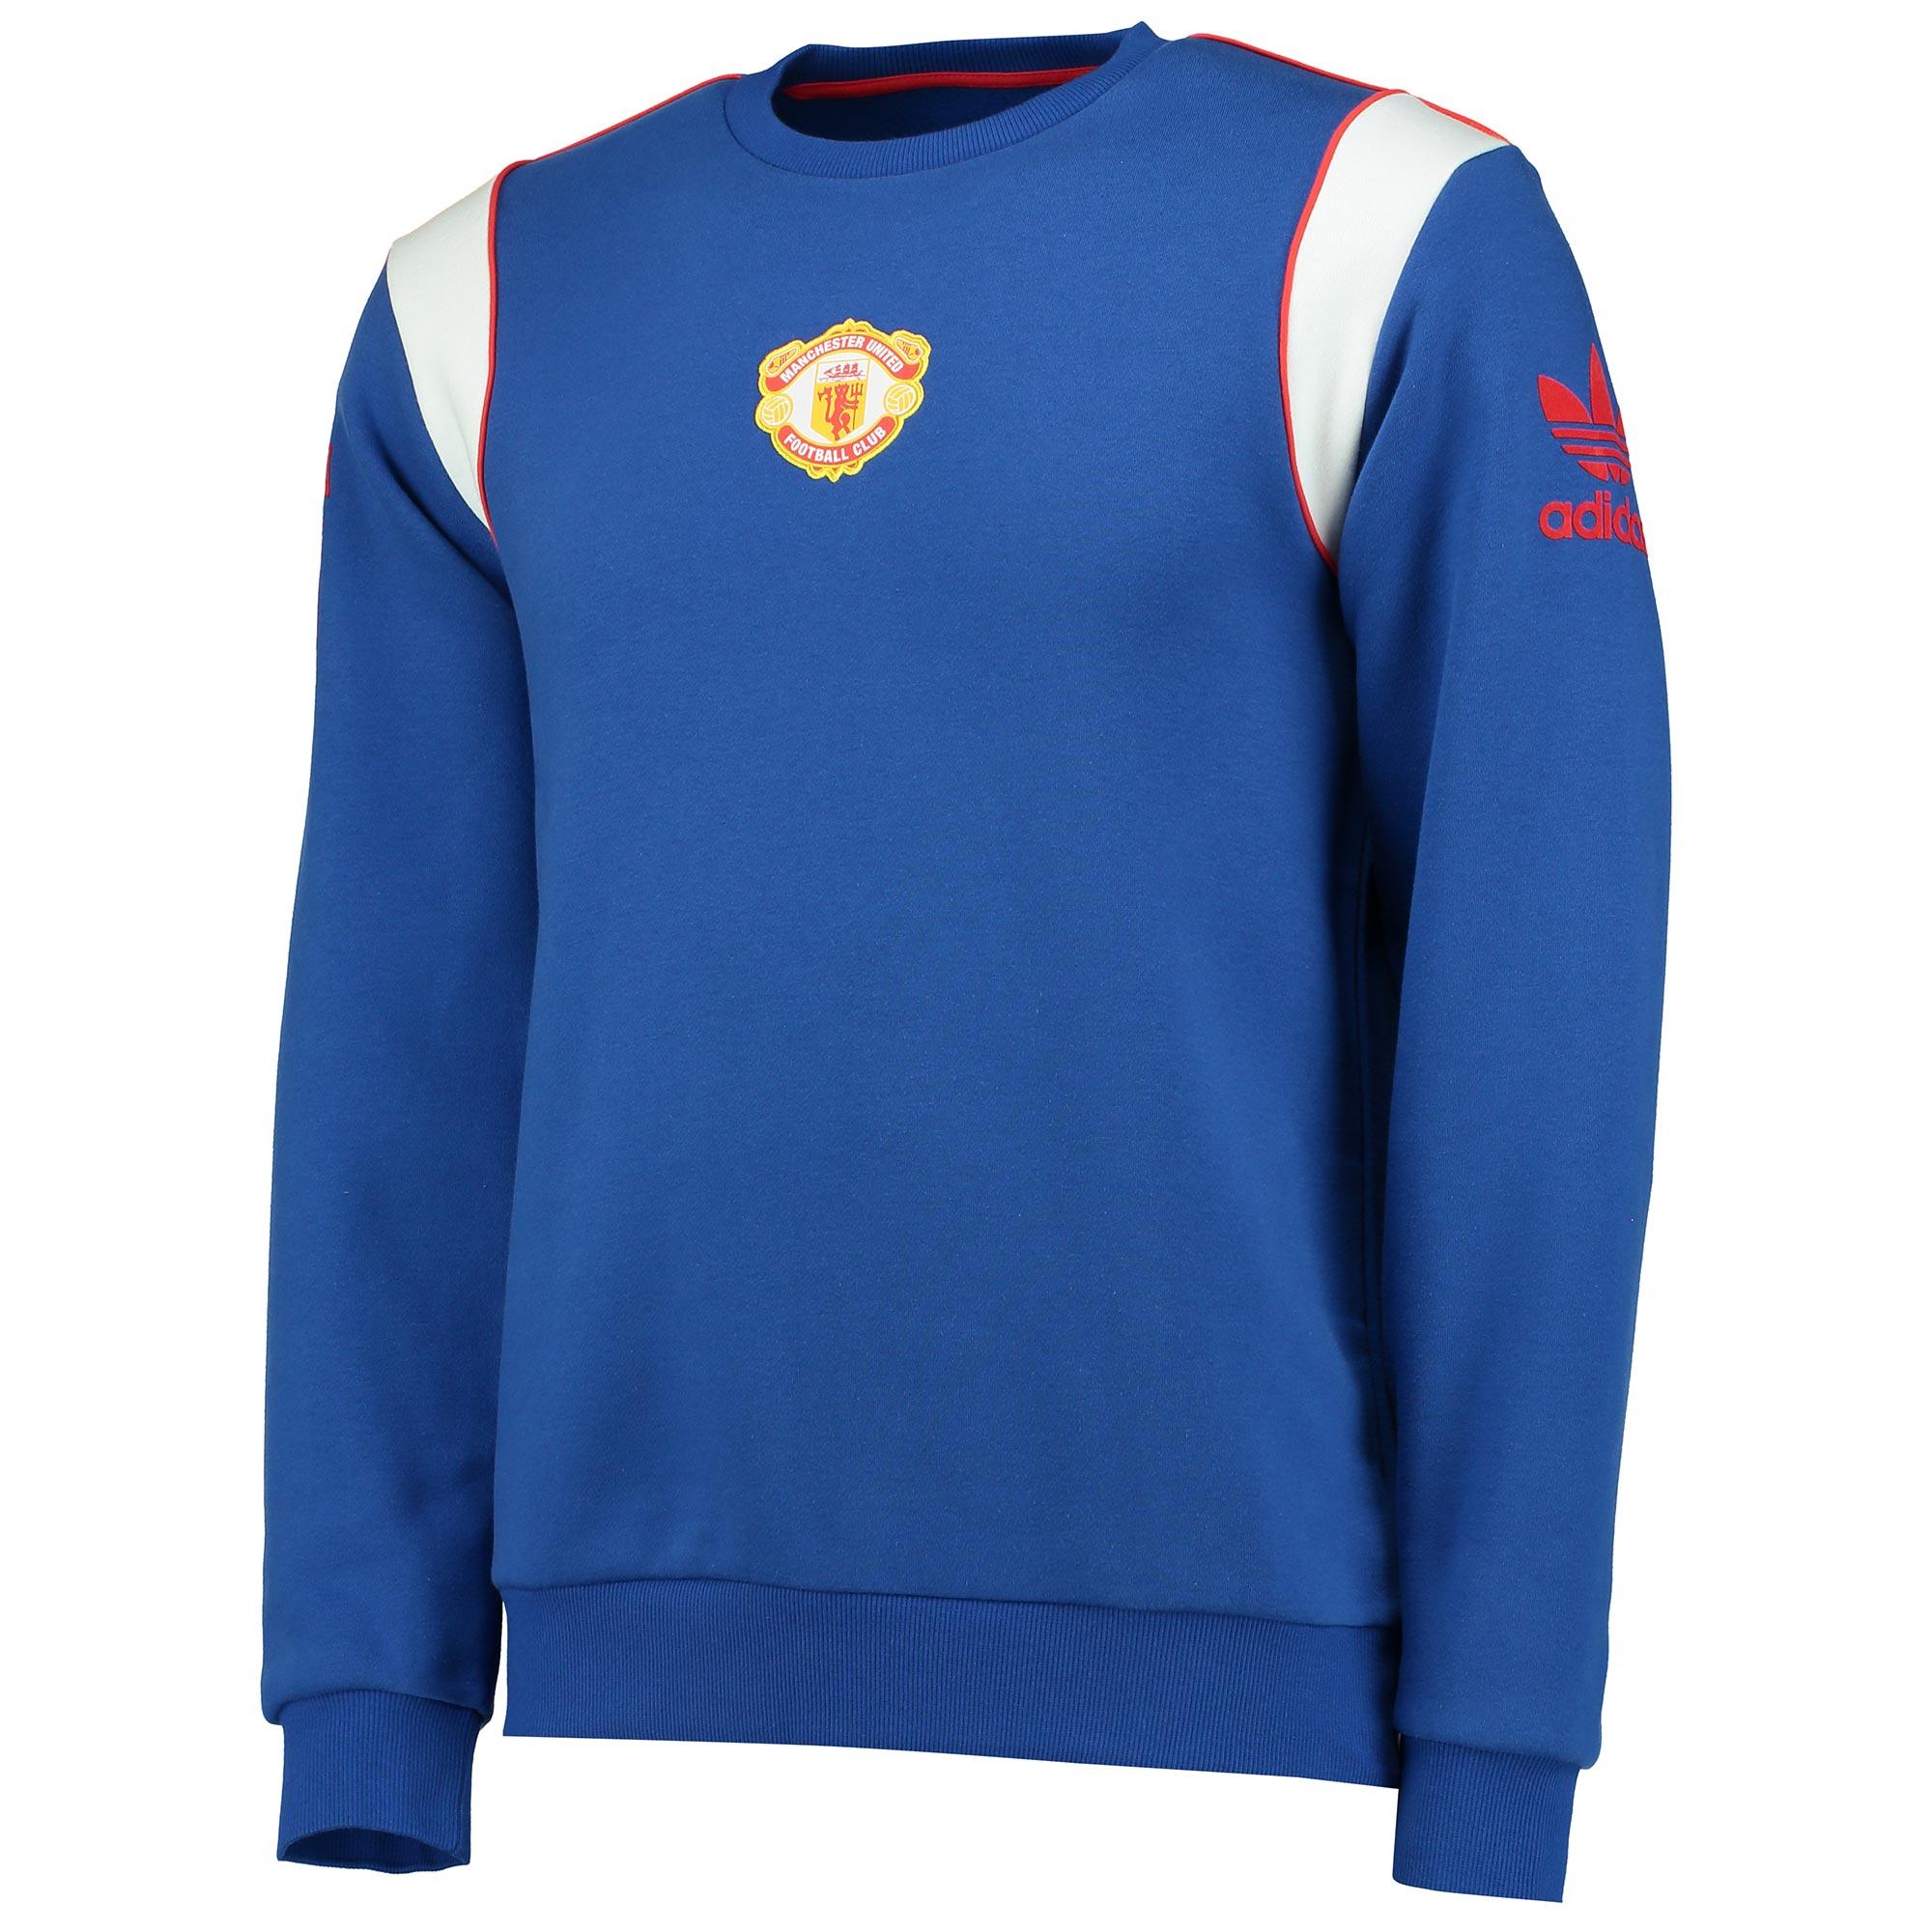 Manchester United Originals 1985 Crew Neck Sweatshirt - Royal